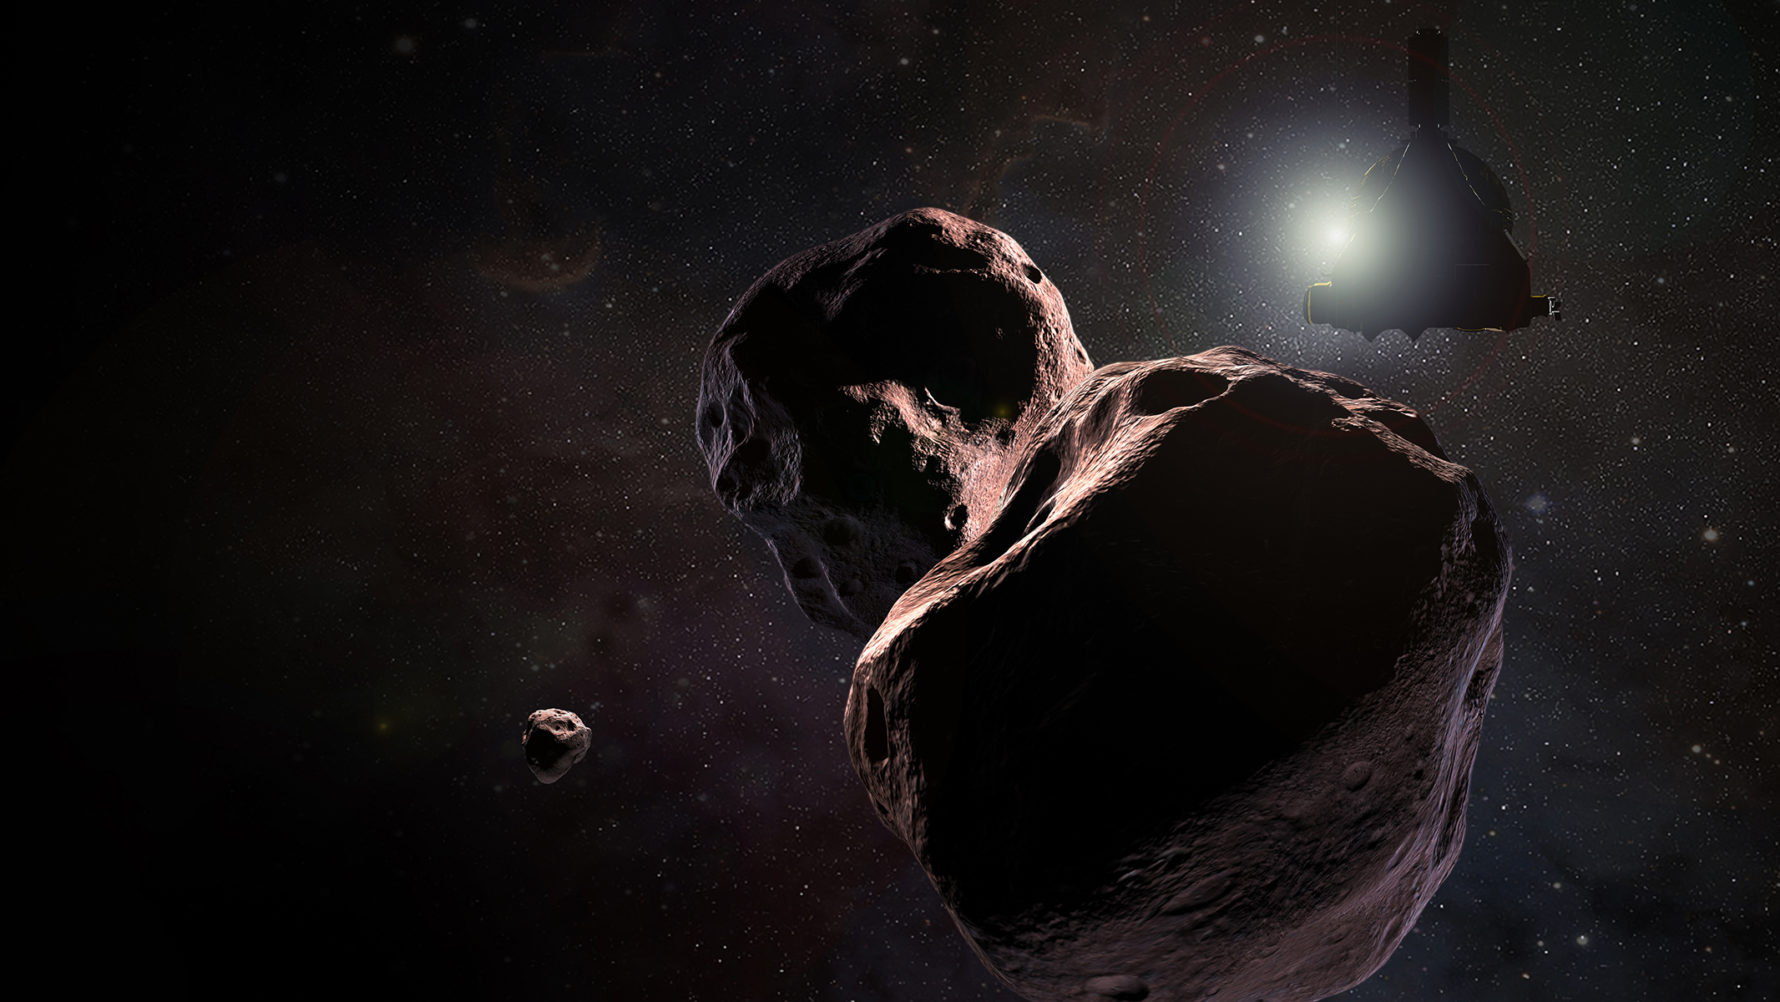 Horizonsecraft Encountering Ultima Thule A Kuiper Belt Object That Orbits 1 Billion Miles 1 6 Billion Kilometers Beyond Pluto On Jan 1 2019